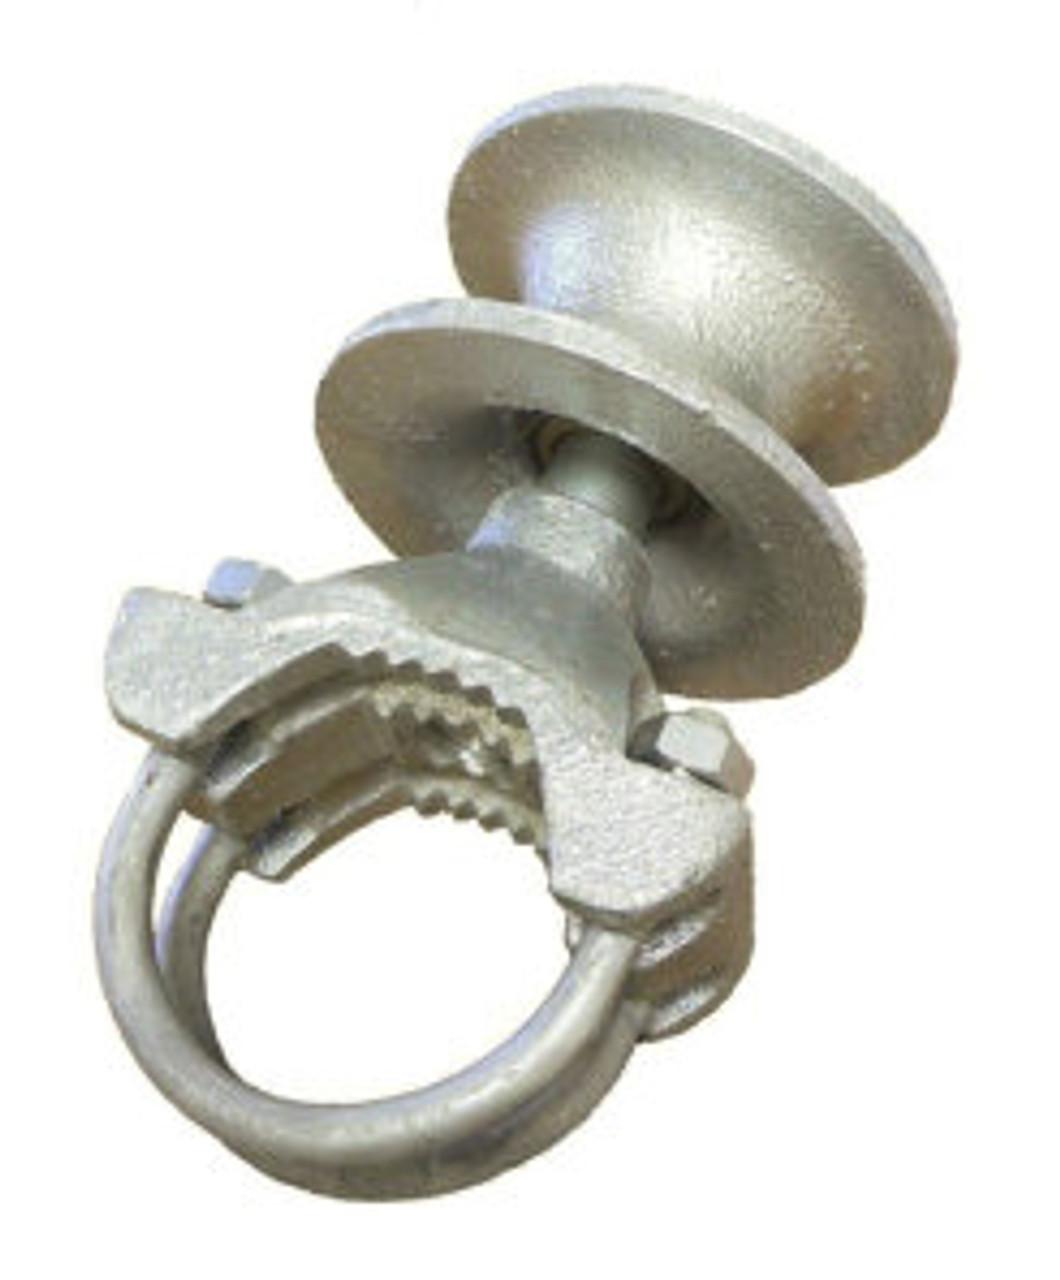 Import Cantilever Gate Roller, Galvanized